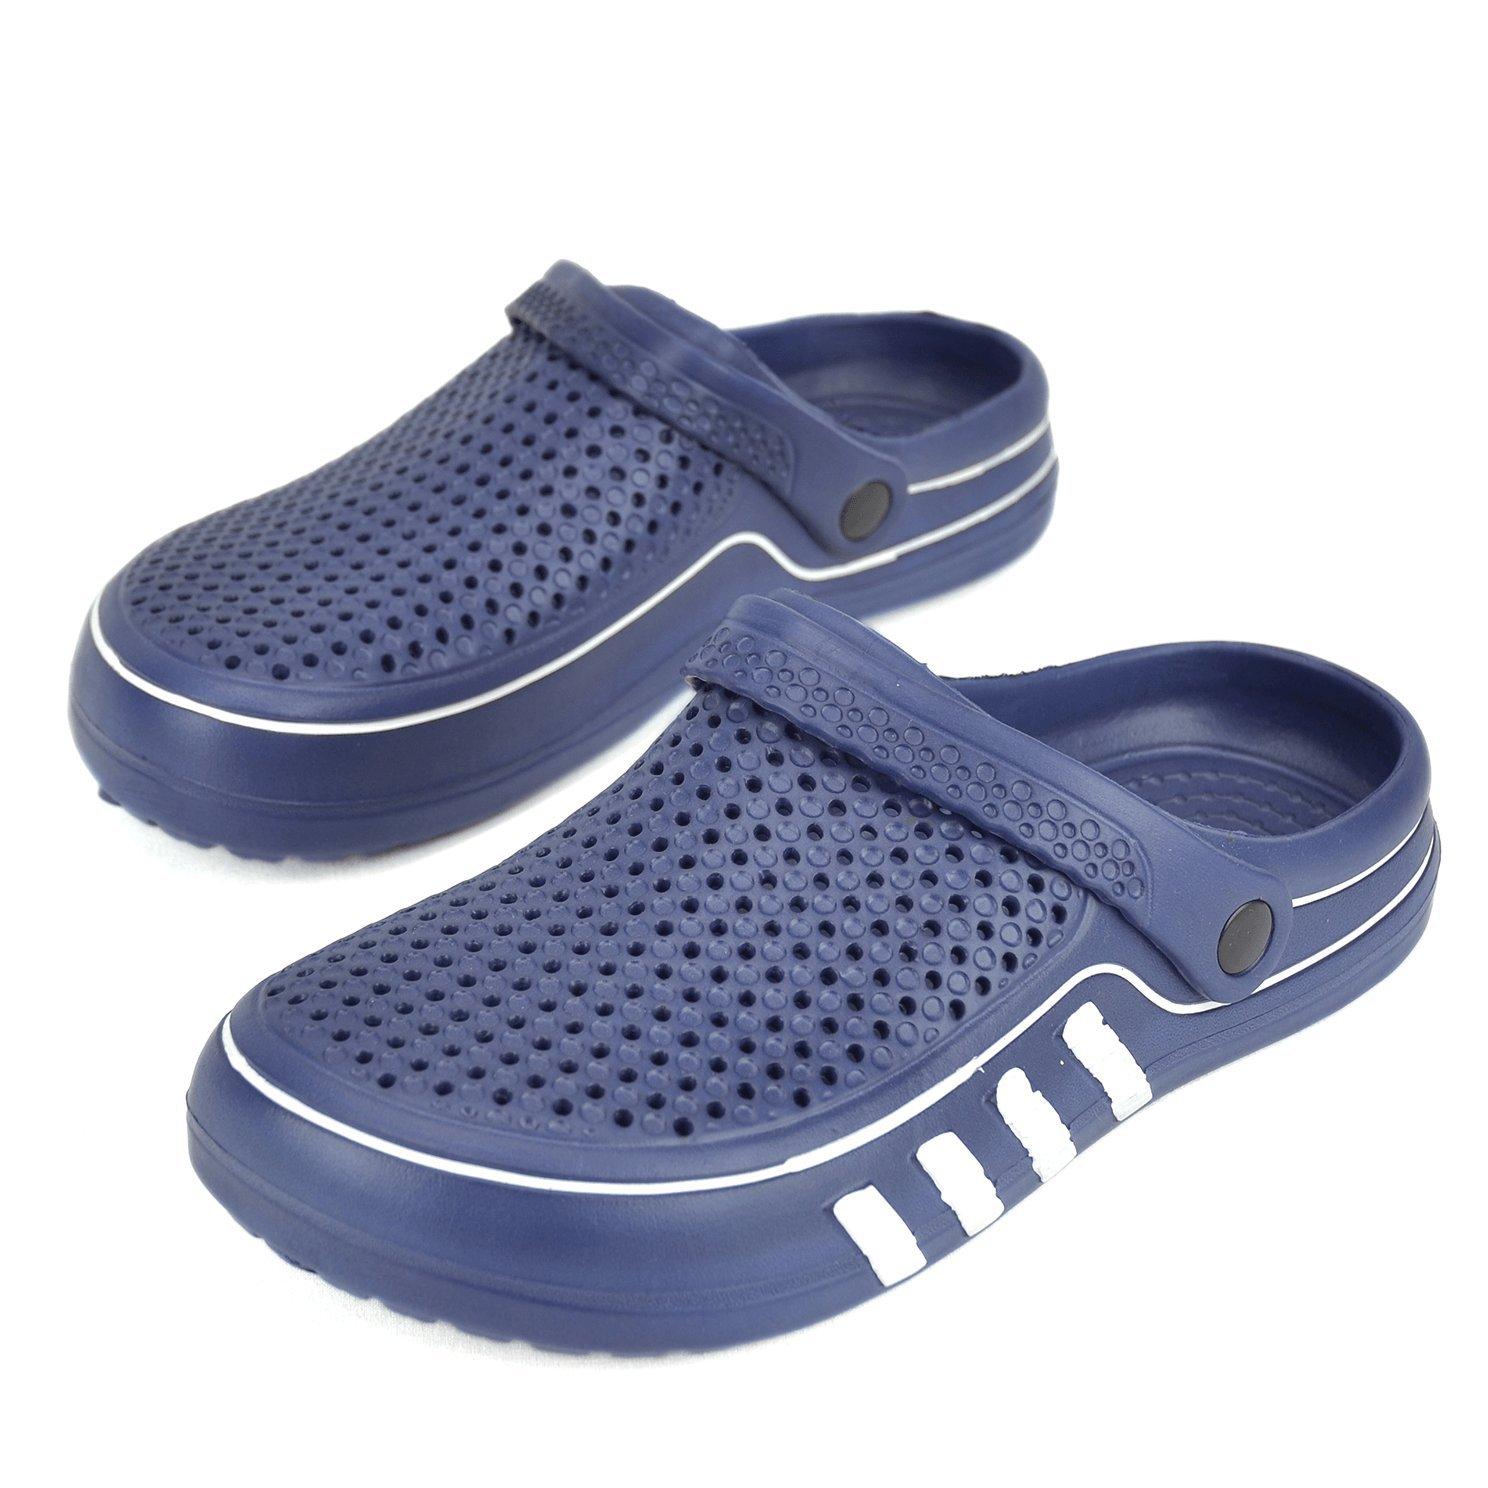 Maya Karis Purse MKP Collection Unisex Outdoor Clogs Sandals Lightweight Summer Slippers Indoor Home Shoes (7 US Men/9 US Women M, Navy/White)